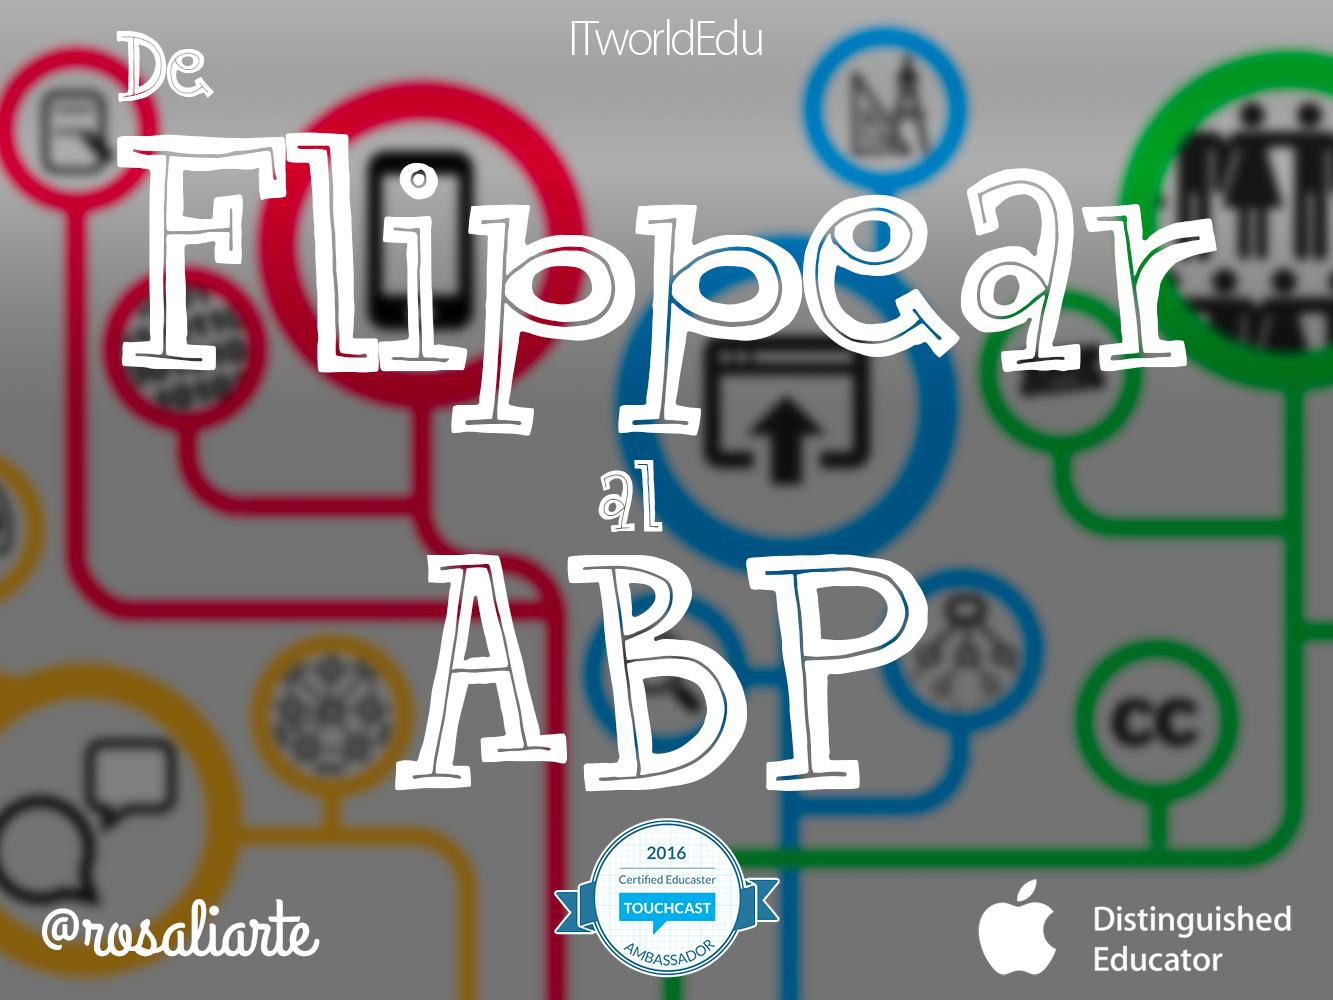 iTworldEdu 8: De Flippear al ABP